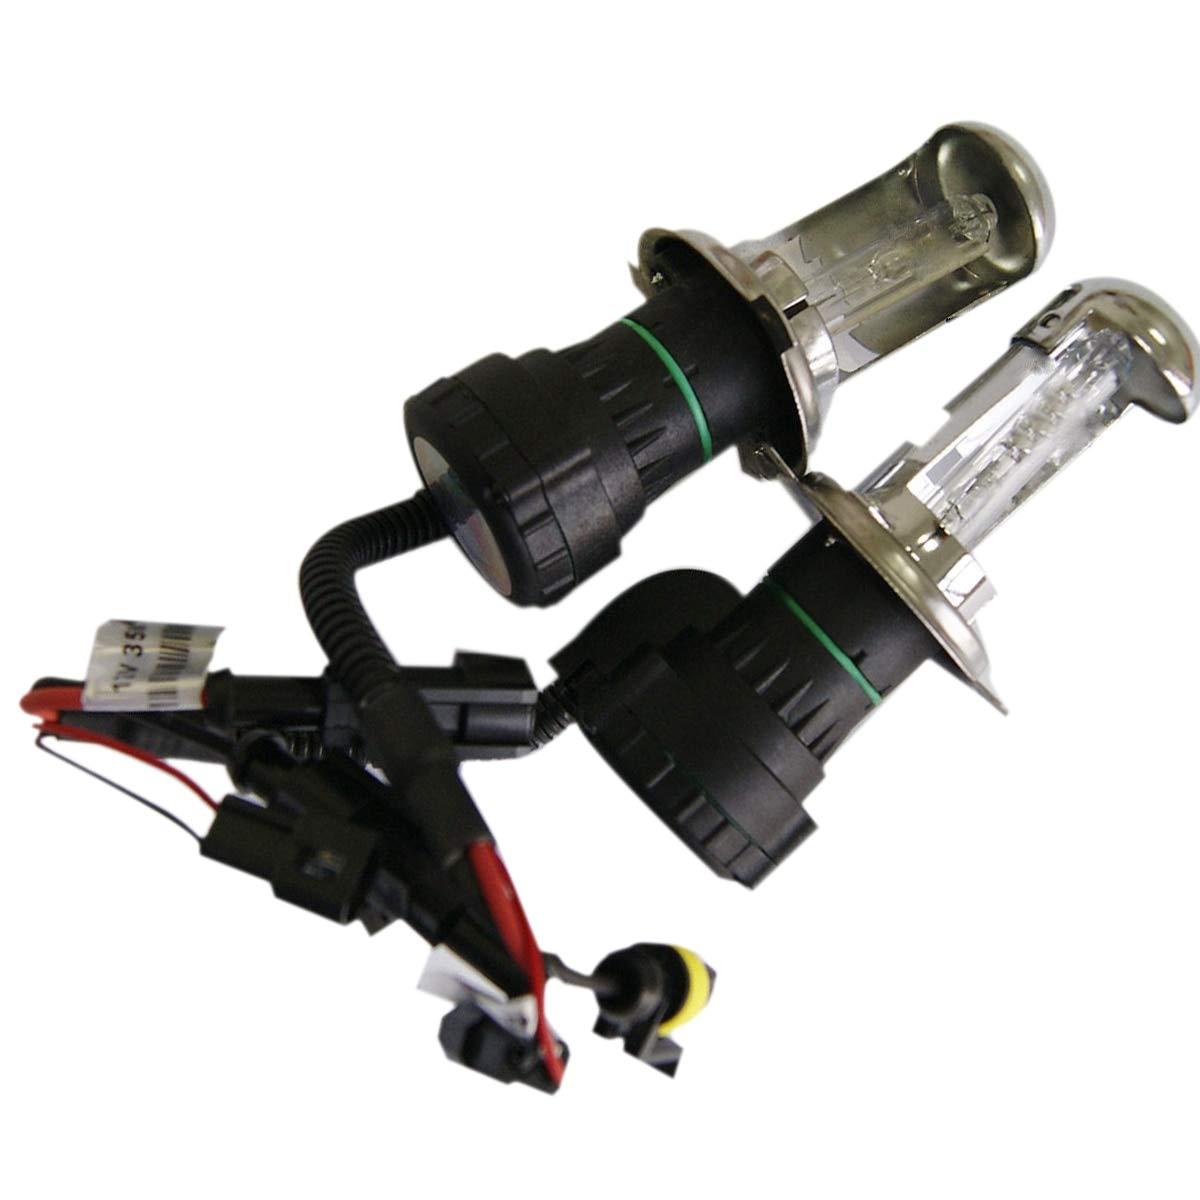 FY Garage - Tonewan 2X H4-3 Xenon 12v 35W H4 xenon HID For Car Headlight Replacement lamps Bulb light H4 Xenon Hi/Lo Beam 3000K-12000K